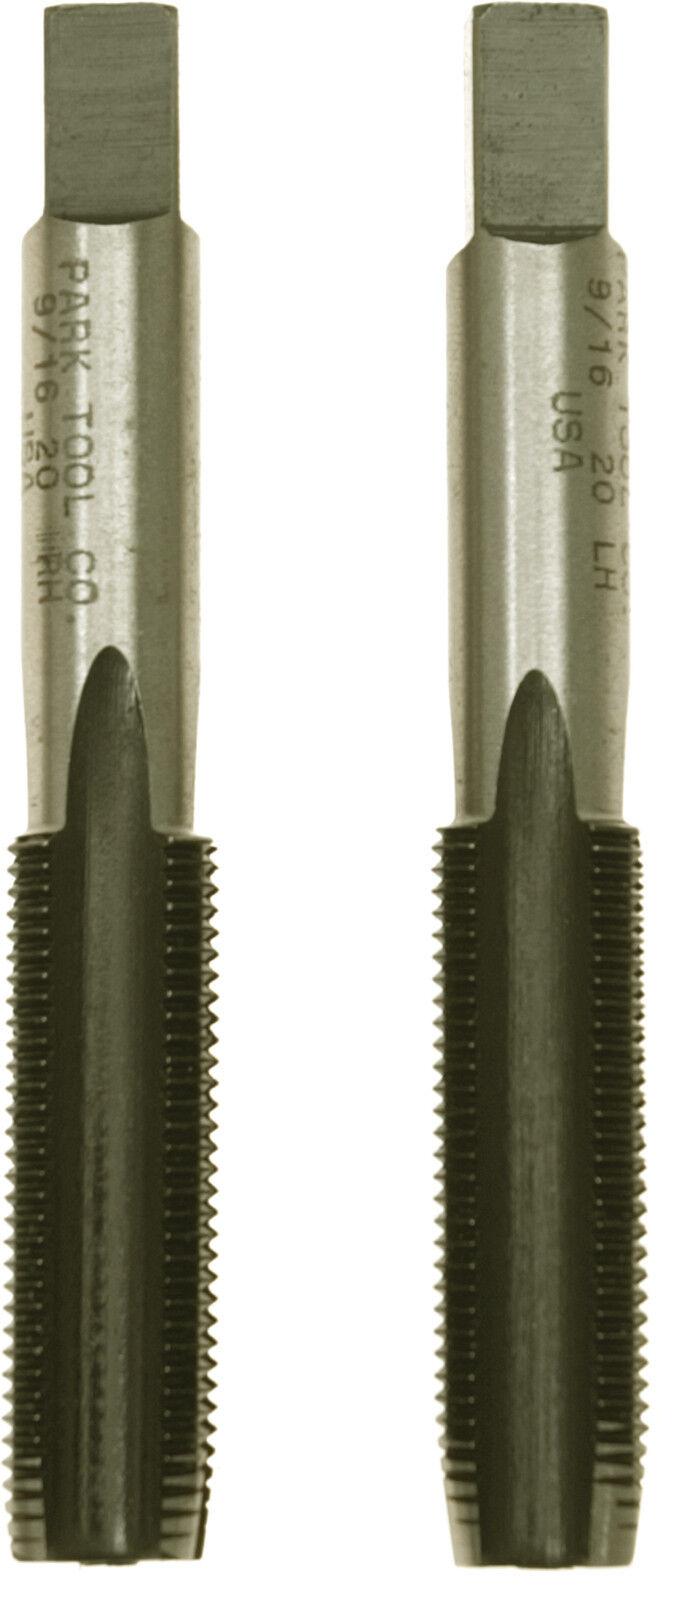 Park Tool crank pedal taps 9 16